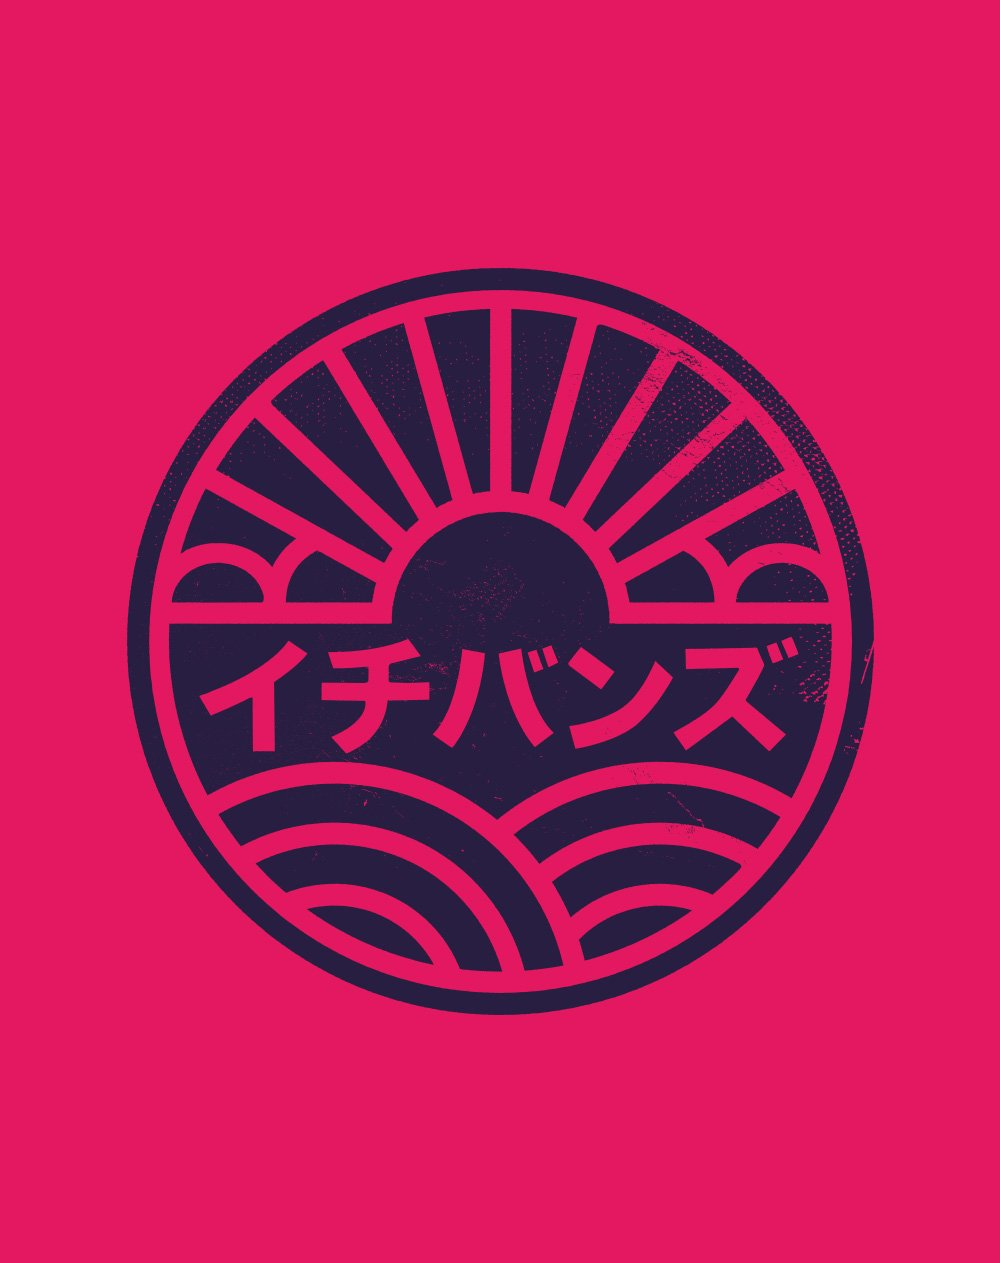 ICHIBUNS logo and branding by Spinachdesign.com